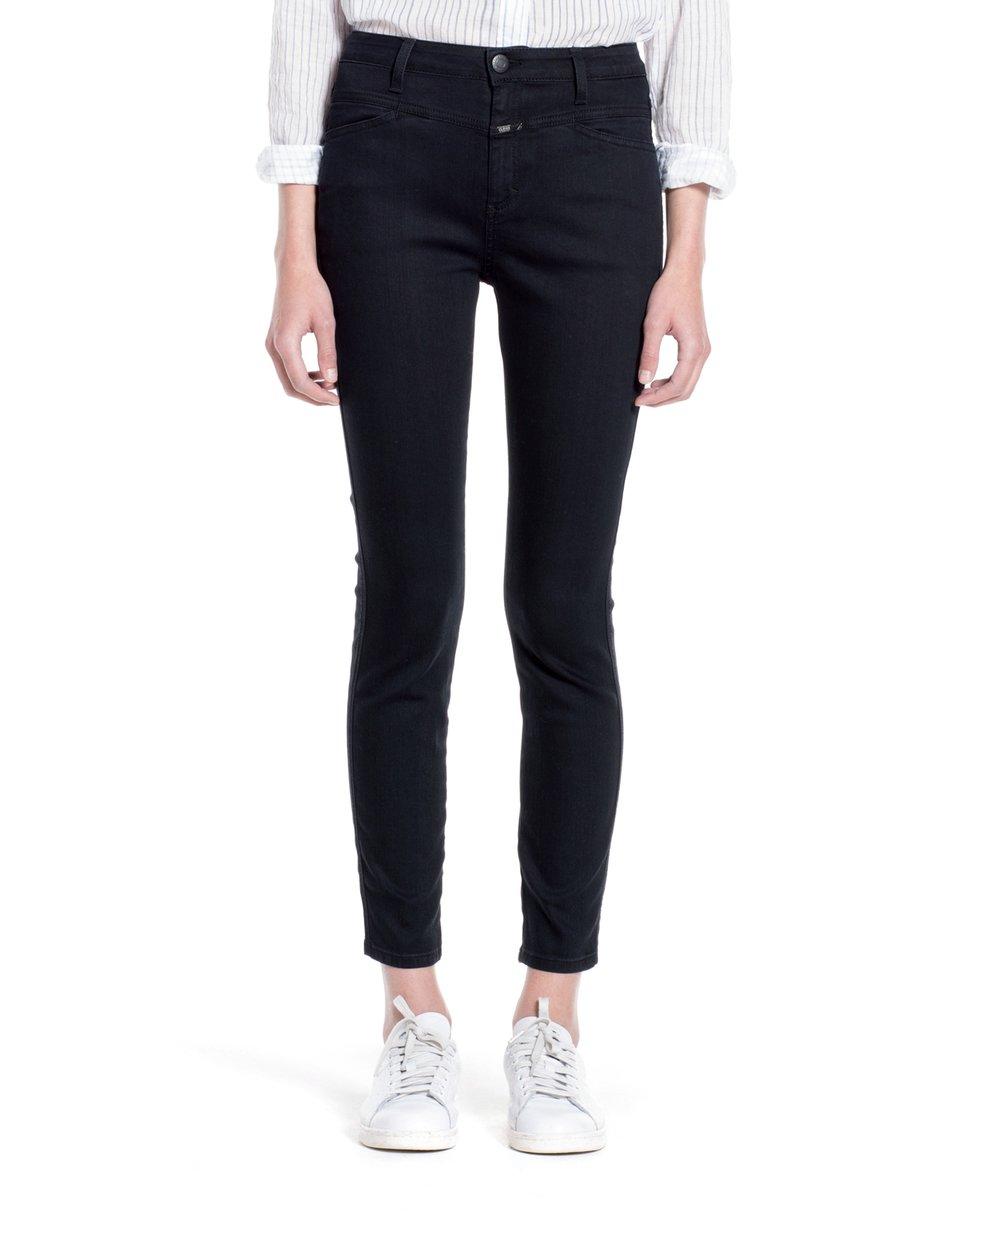 Fashion Jeans Skinny Inc Black Closed Pusher qgXH6cw